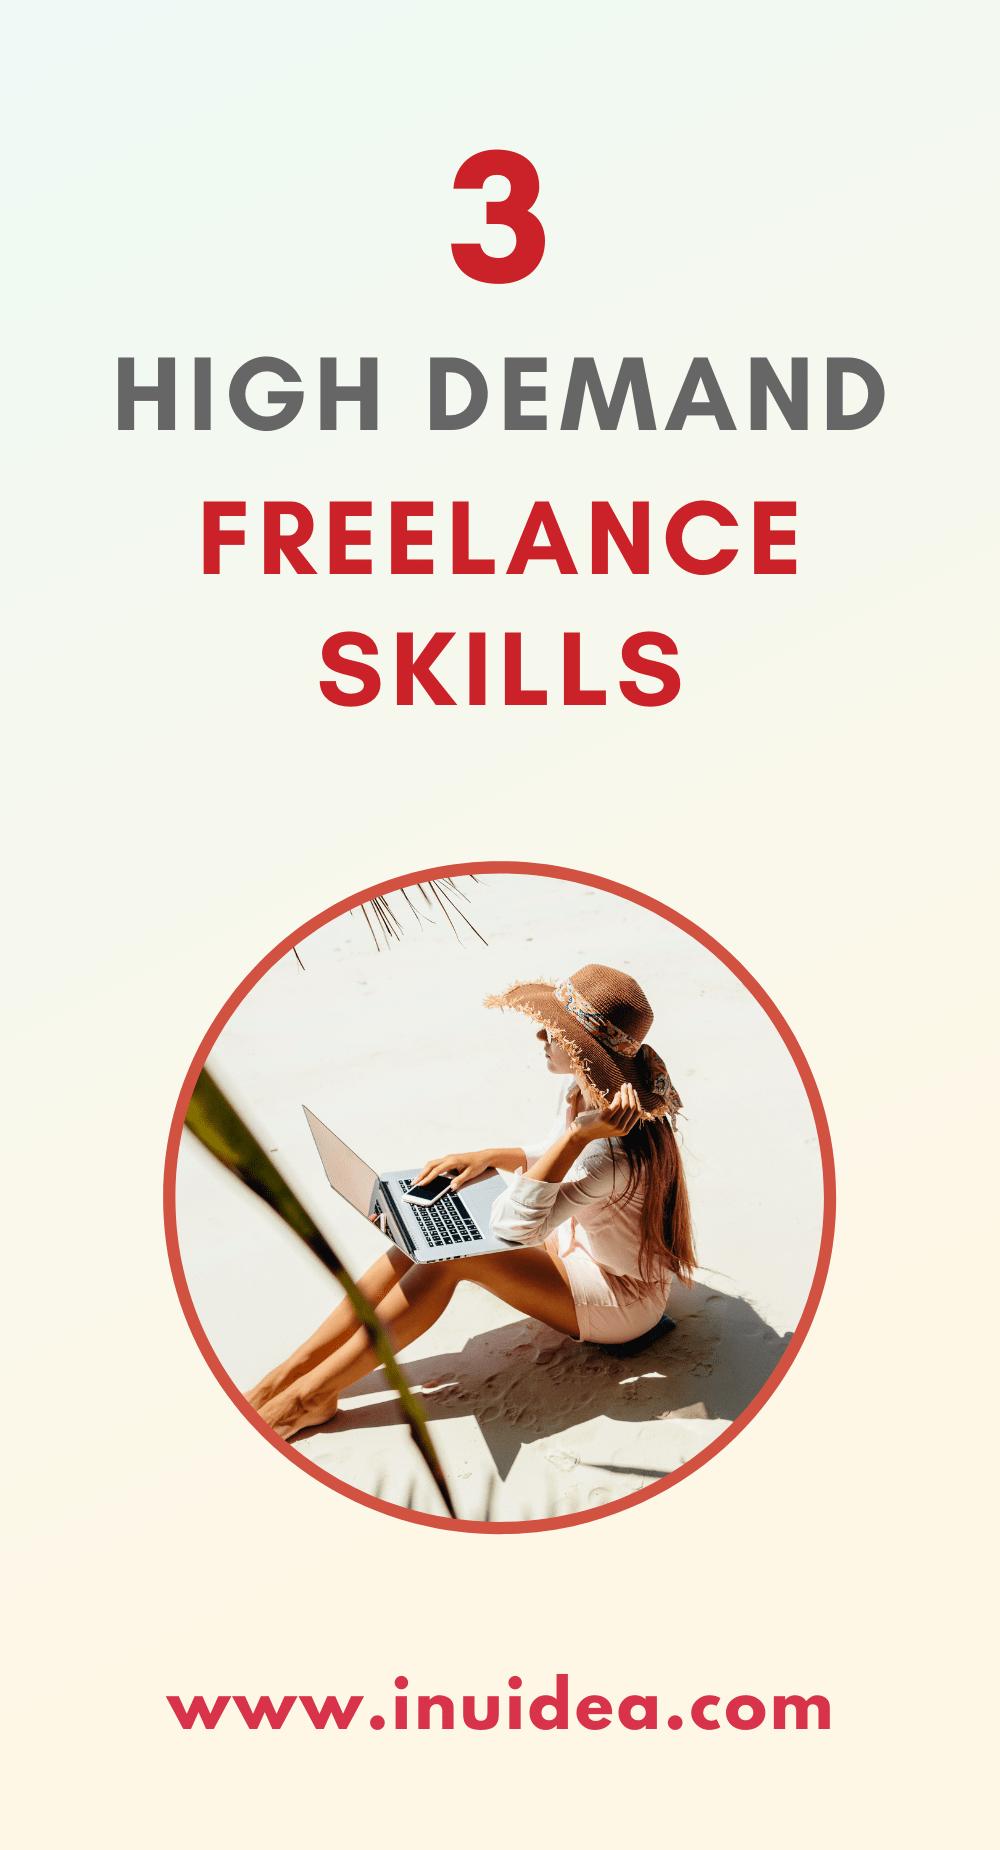 Top 3 High Demand Freelance Skills